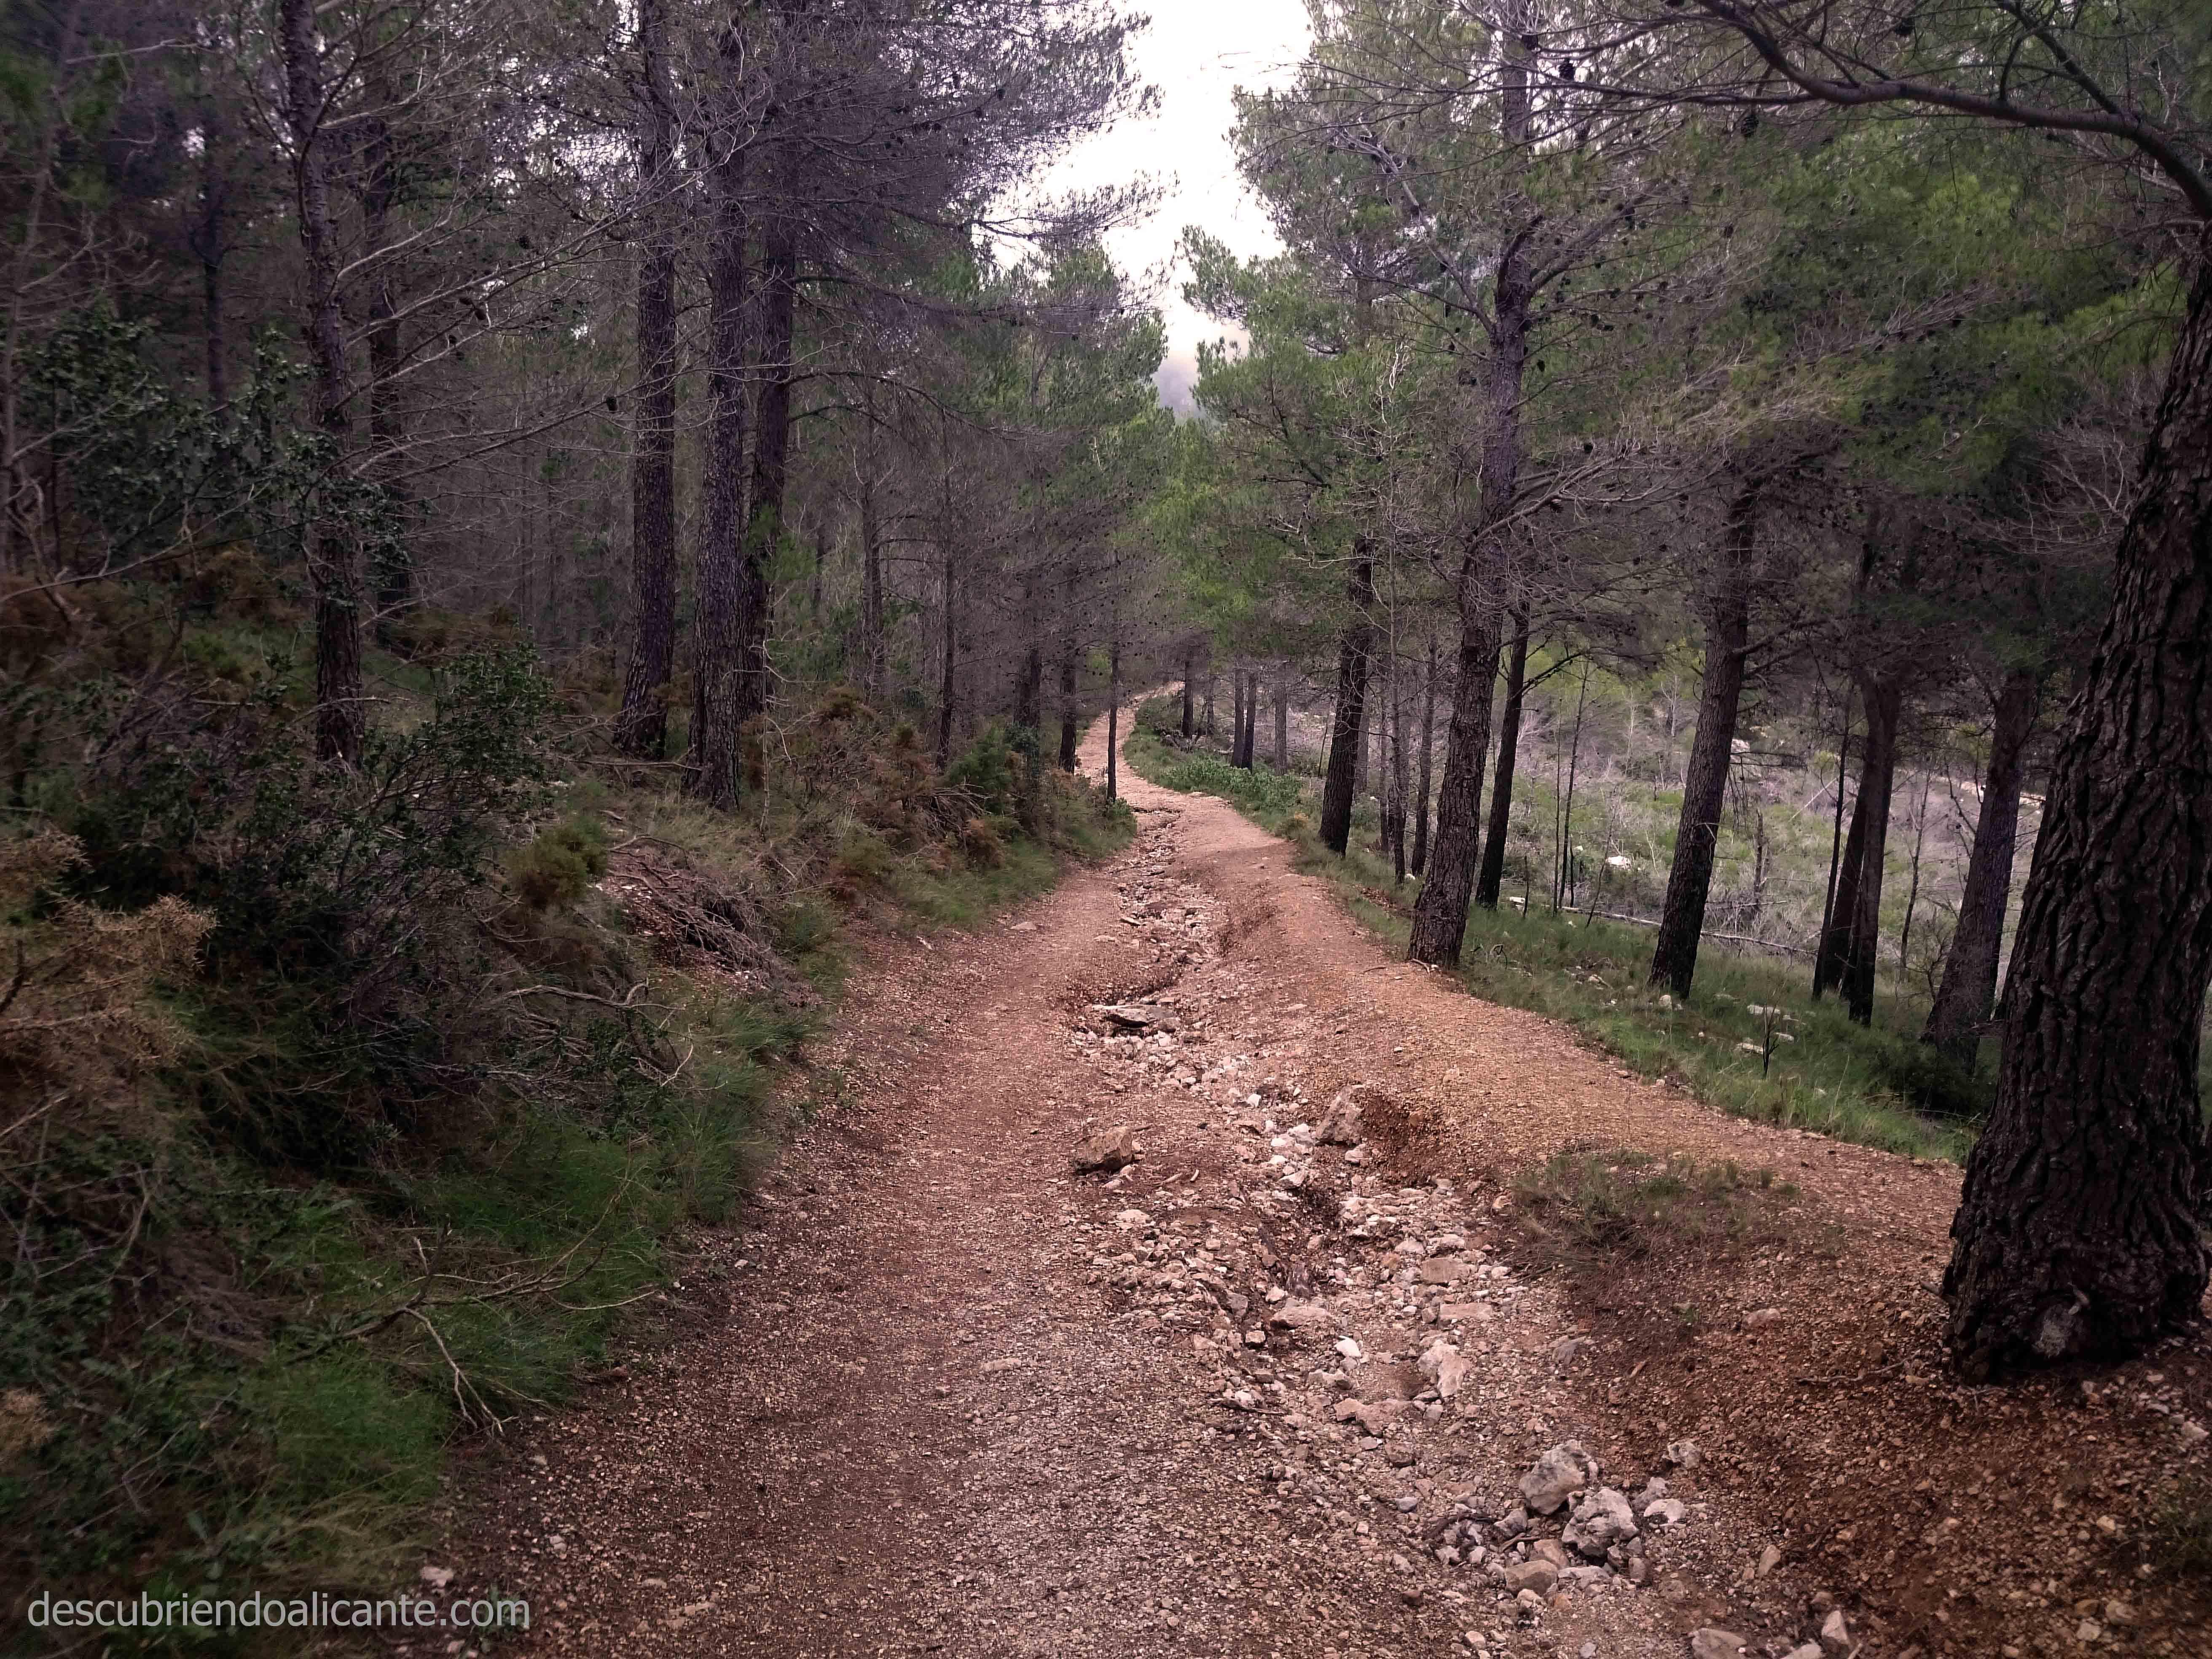 99-montana-bosque-alicante-puig-campana